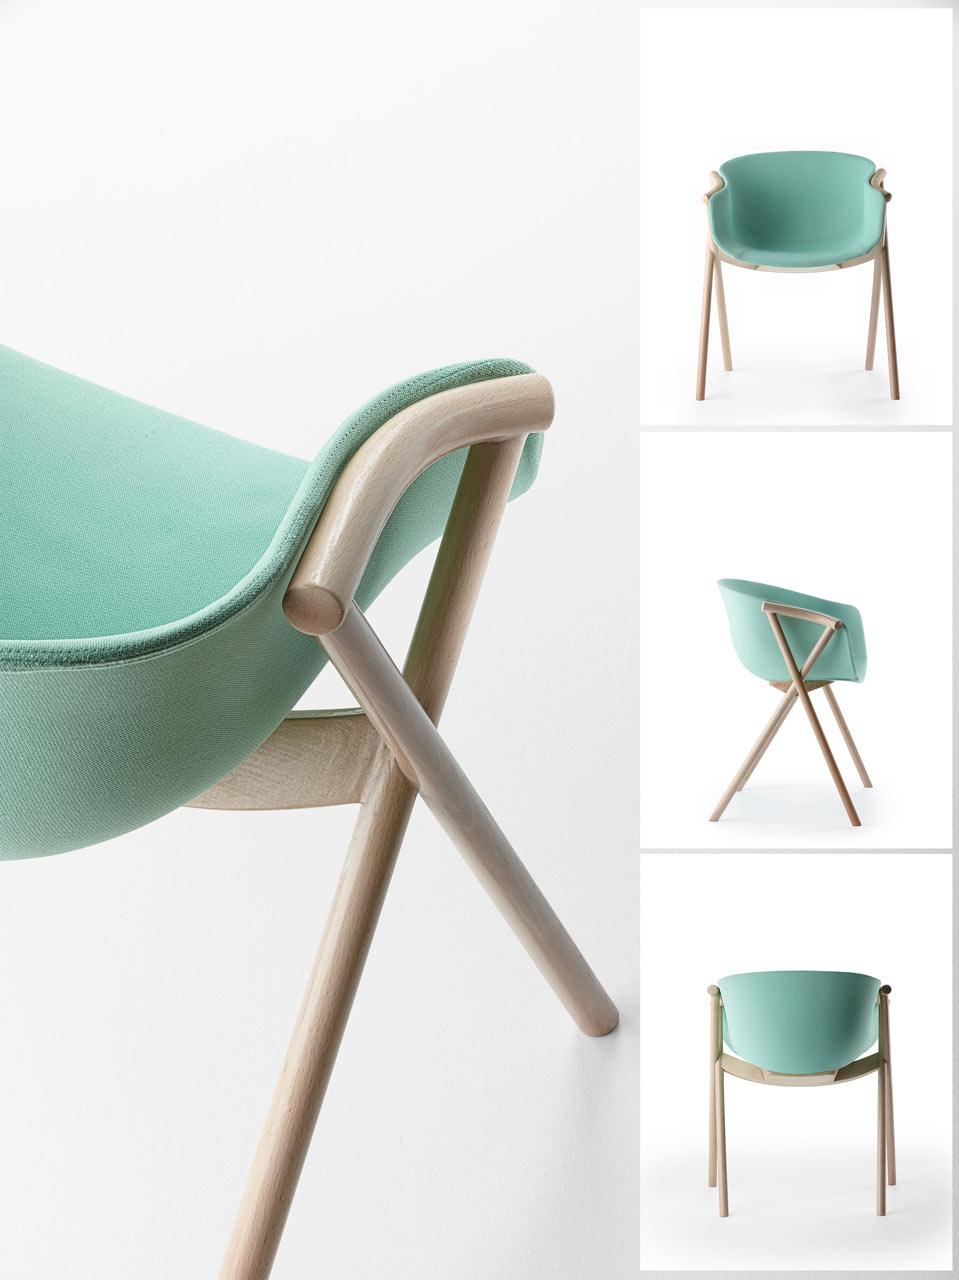 Bai-Chair-Ondarreta-Ander-Lizaso-6